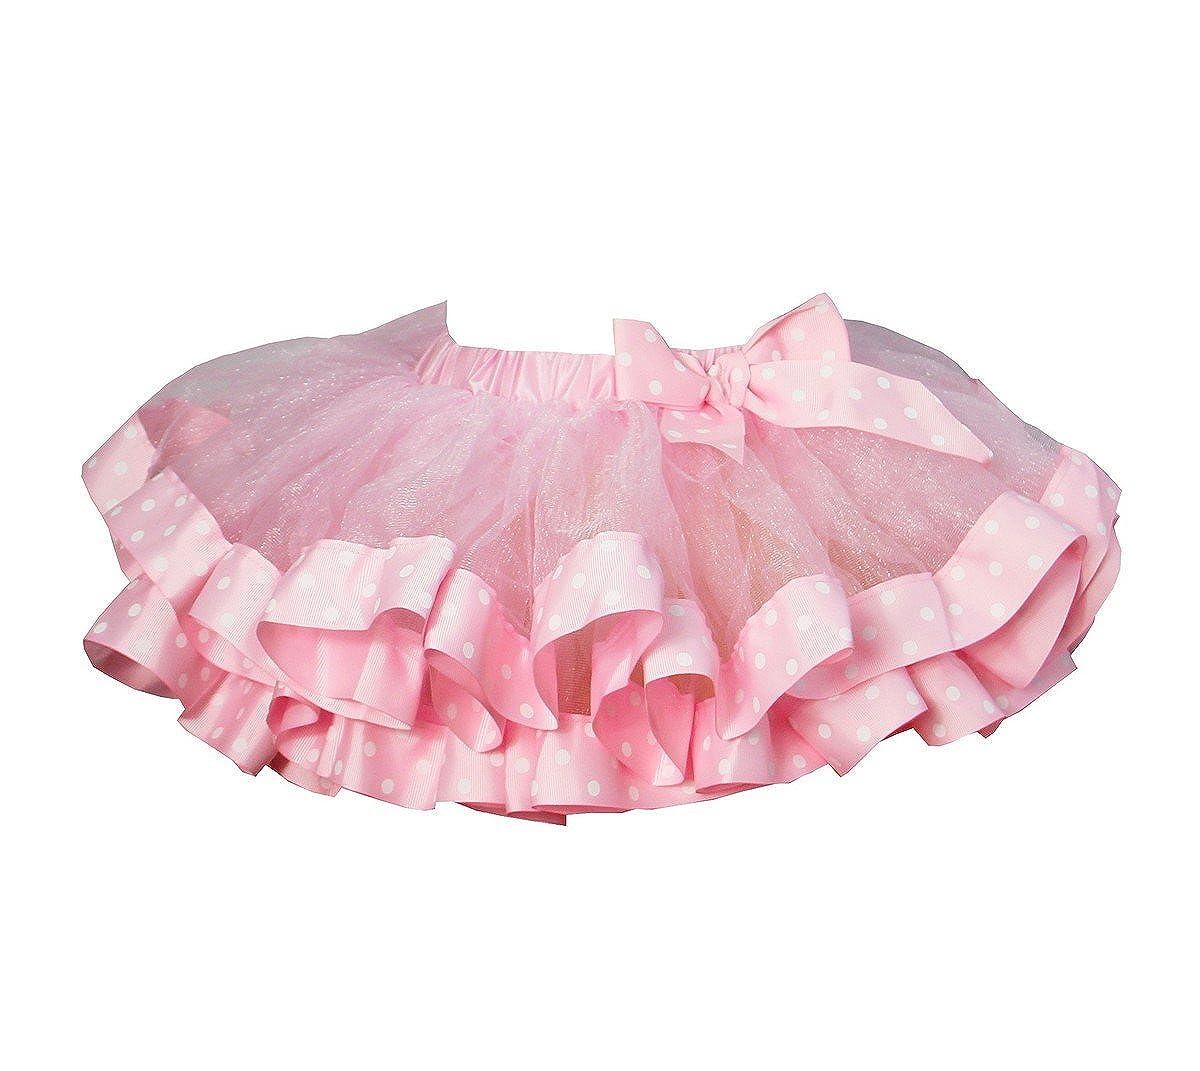 Kirei Sui Girls Lavender Pink Mint Satin Trimmed Unicorn Mermaid Tutu